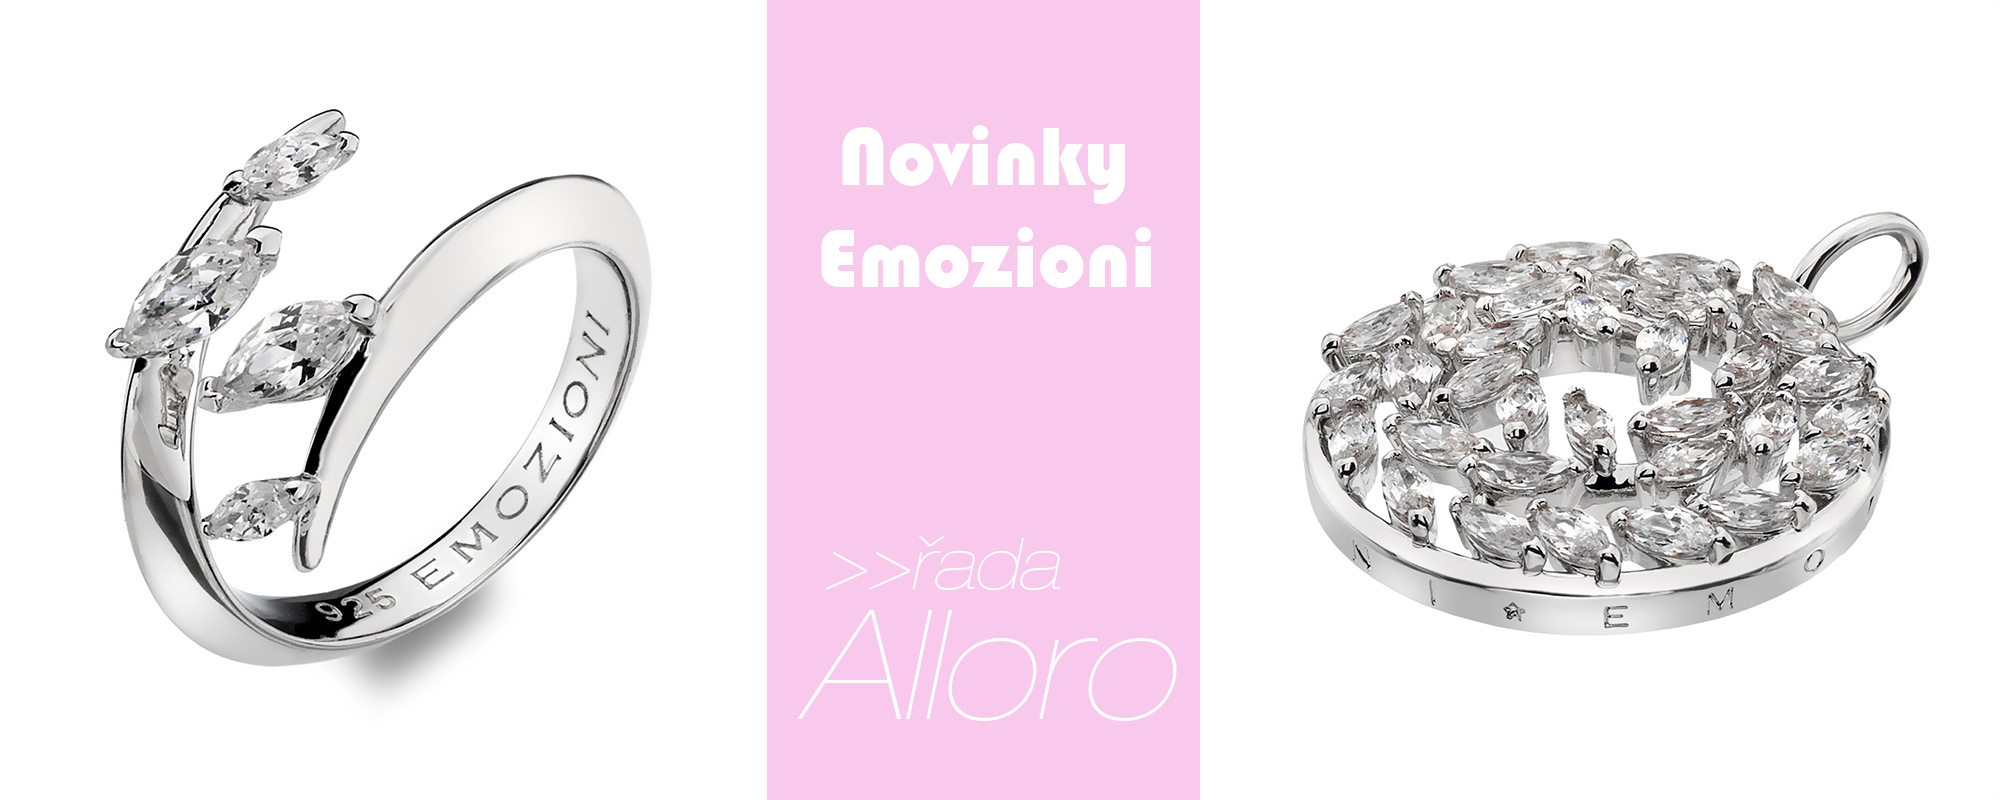 kolekce Emozioni Alloro